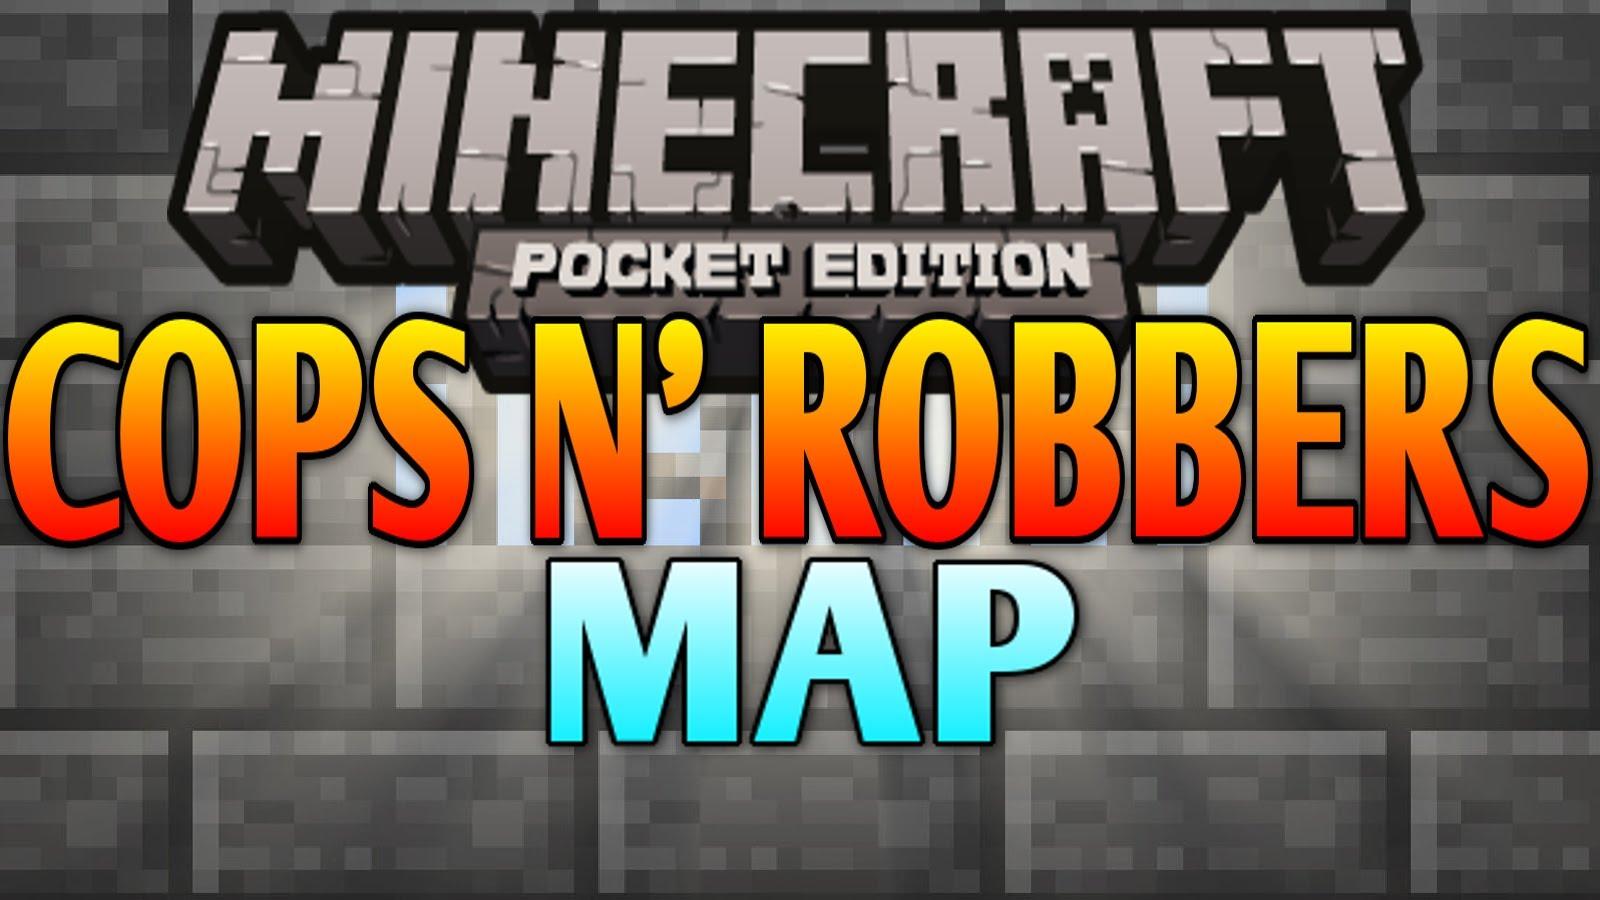 Обновленная карта COPS AND ROBBERS 3.0 [0.8.0]